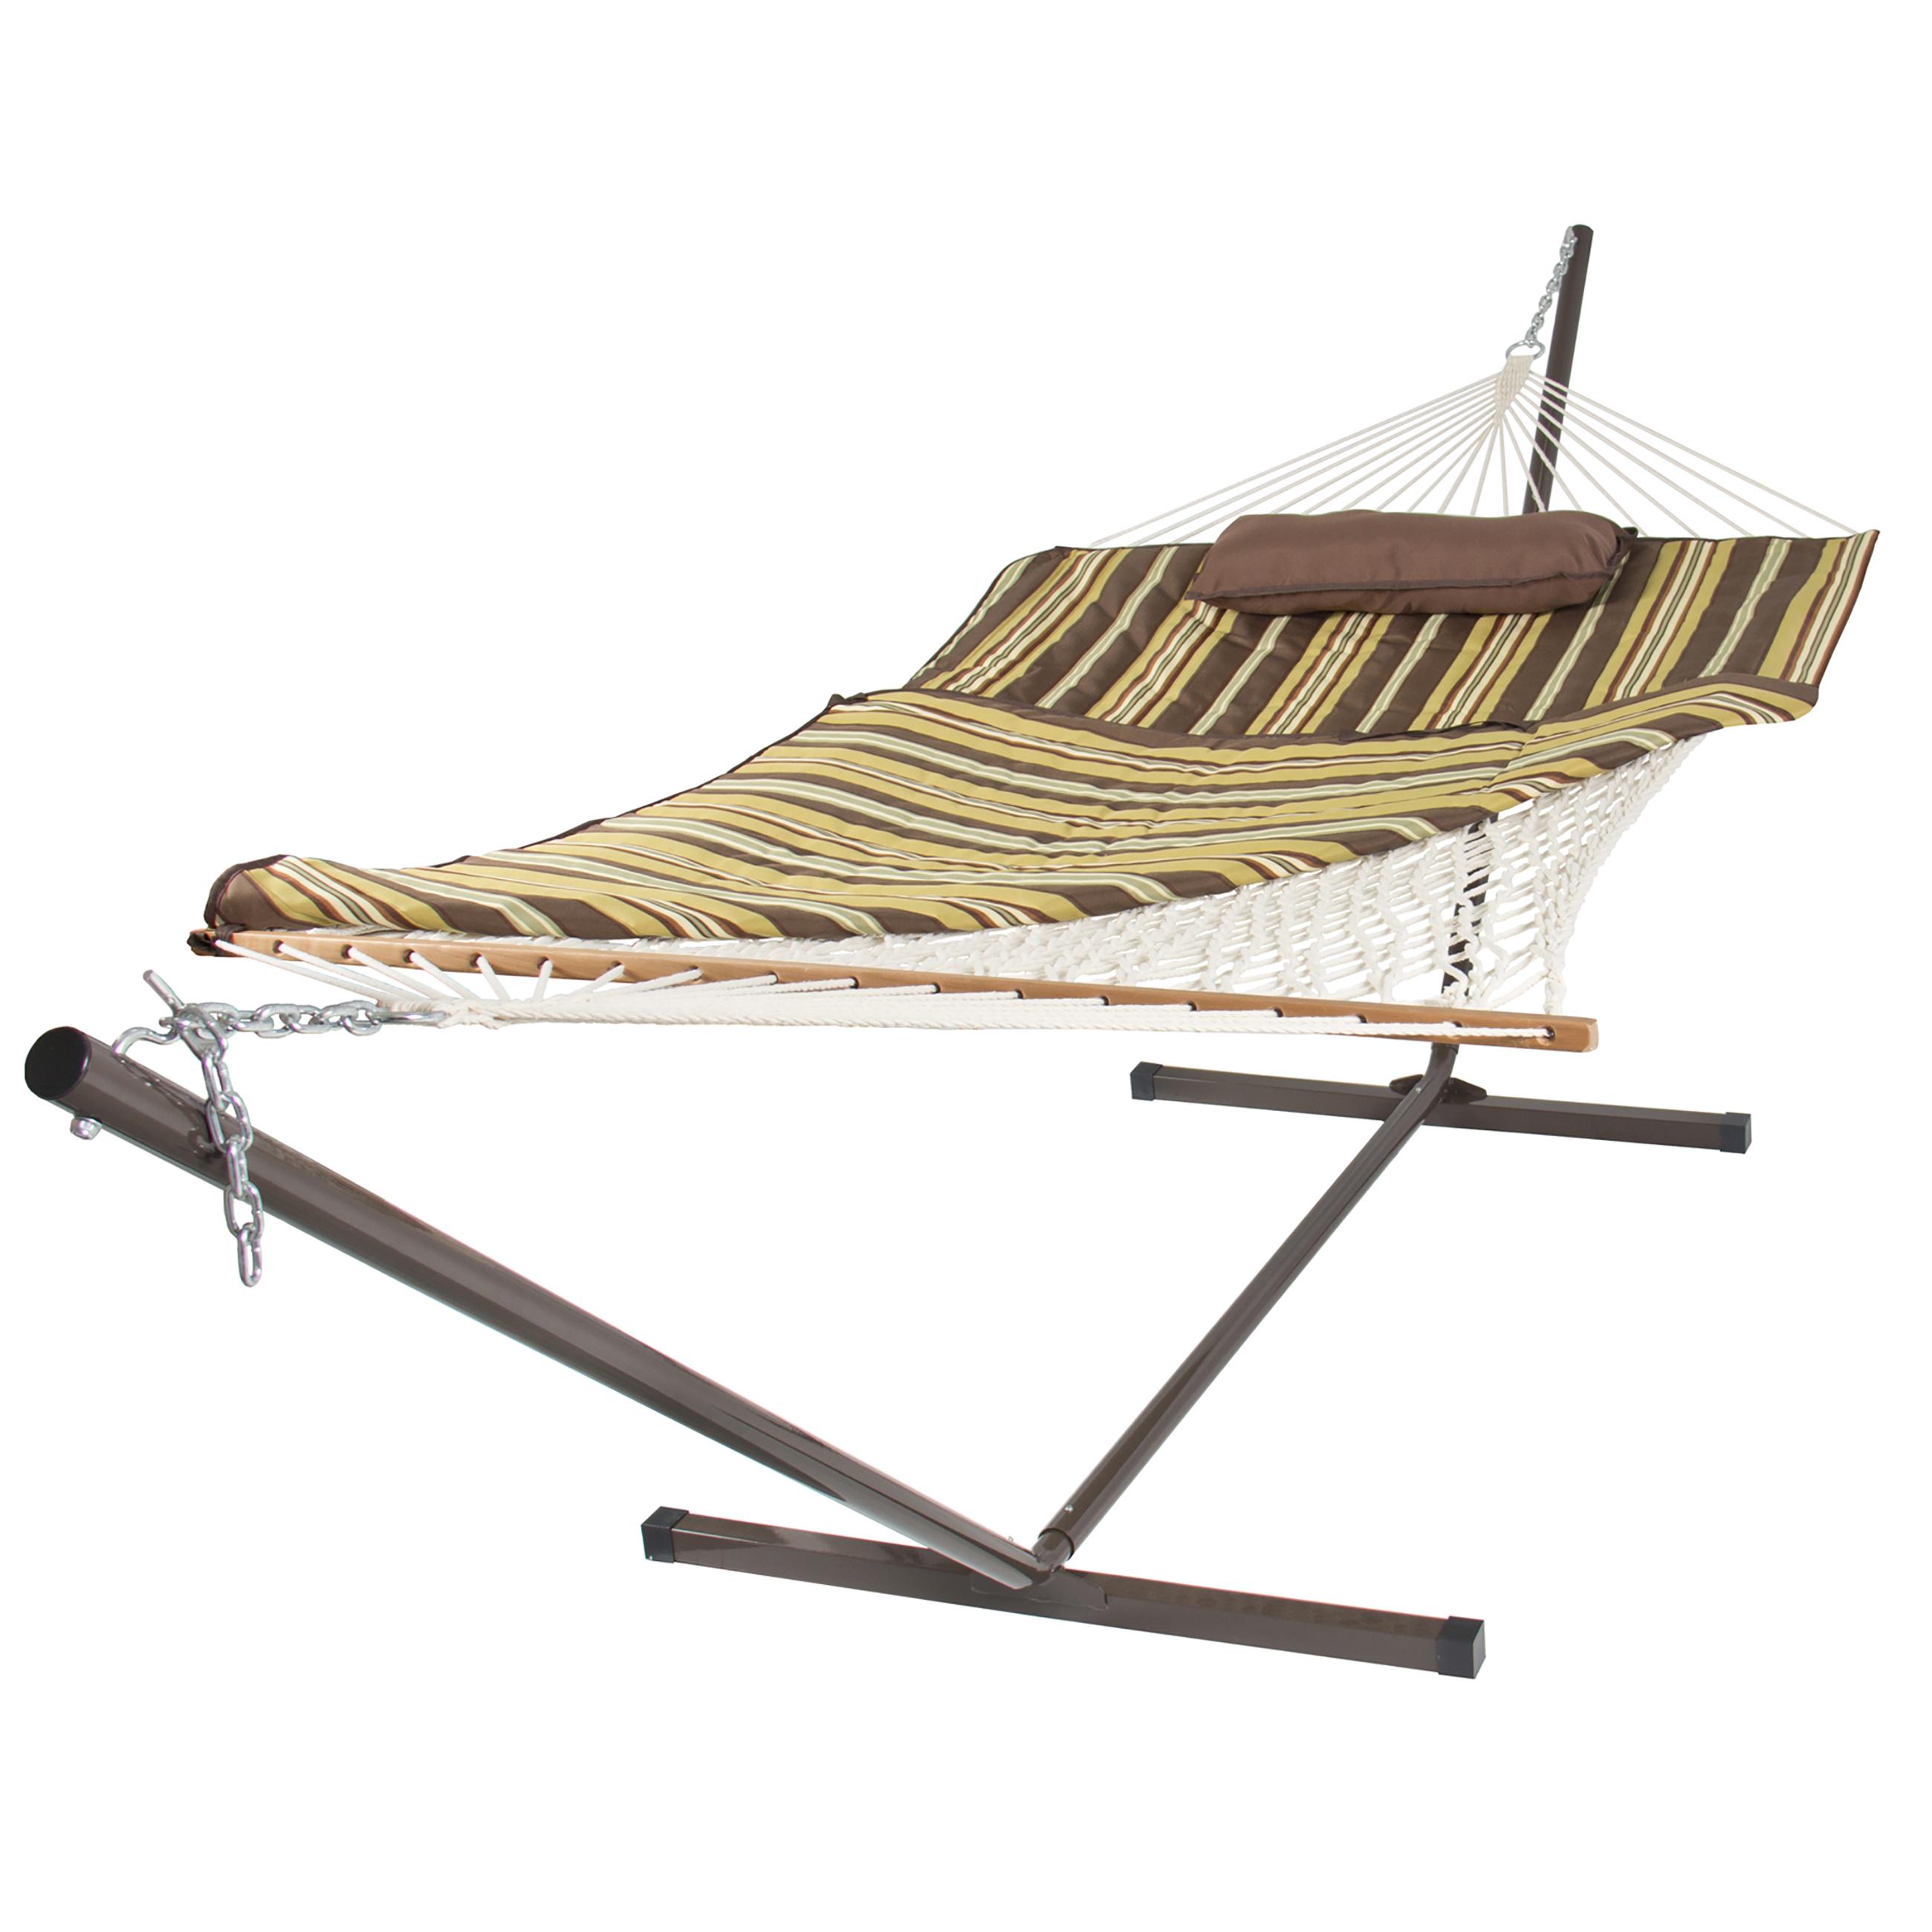 Cotton rope hammock 12 feet steel stand combo w stripe for Rope hammock plans